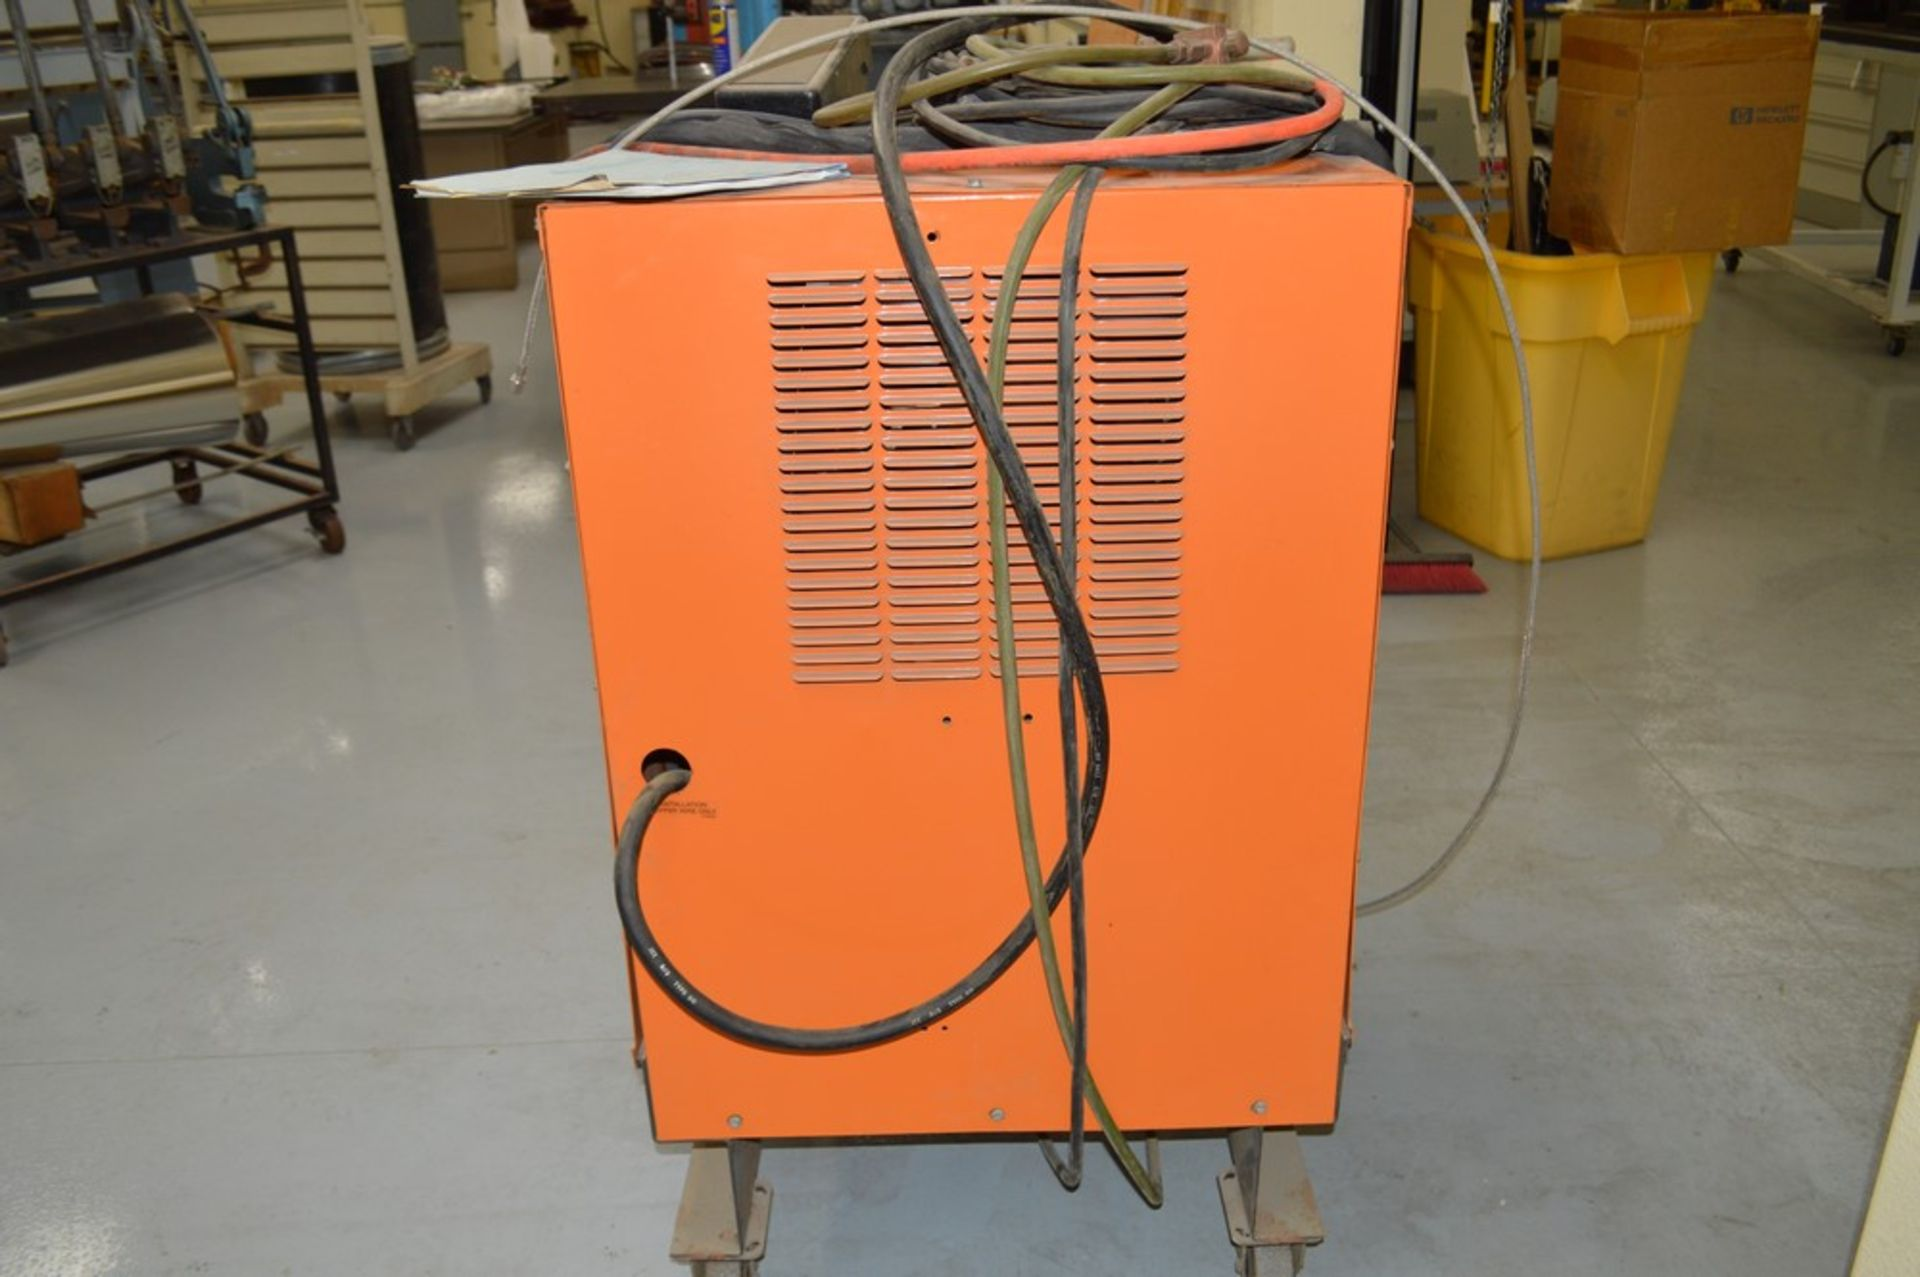 Airco AC/DC Heliwelder, 250 amp welder, AC/DC Tig welder, mounted on rolling steel cart - Image 4 of 5